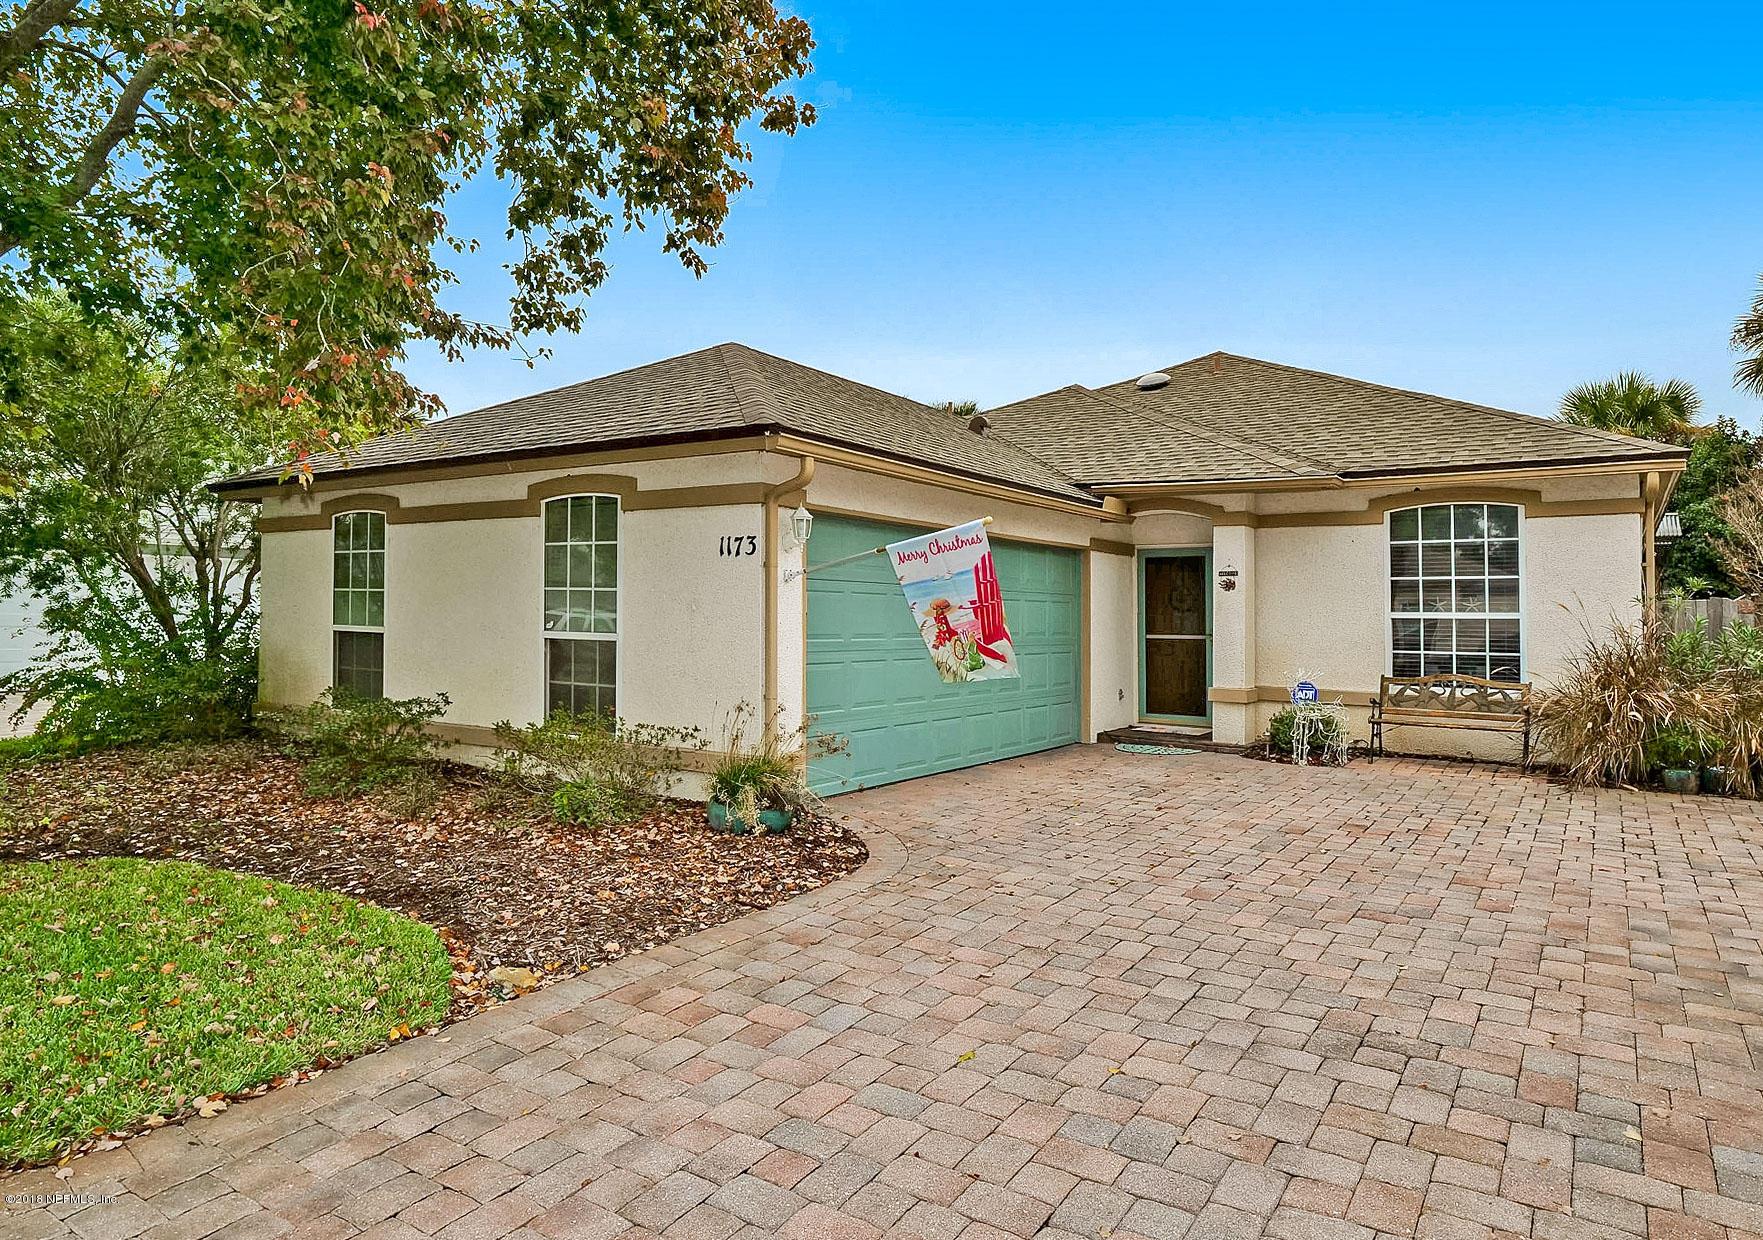 1173 SANDPIPER, ATLANTIC BEACH, FLORIDA 32233, 3 Bedrooms Bedrooms, ,2 BathroomsBathrooms,Residential - single family,For sale,SANDPIPER,970314